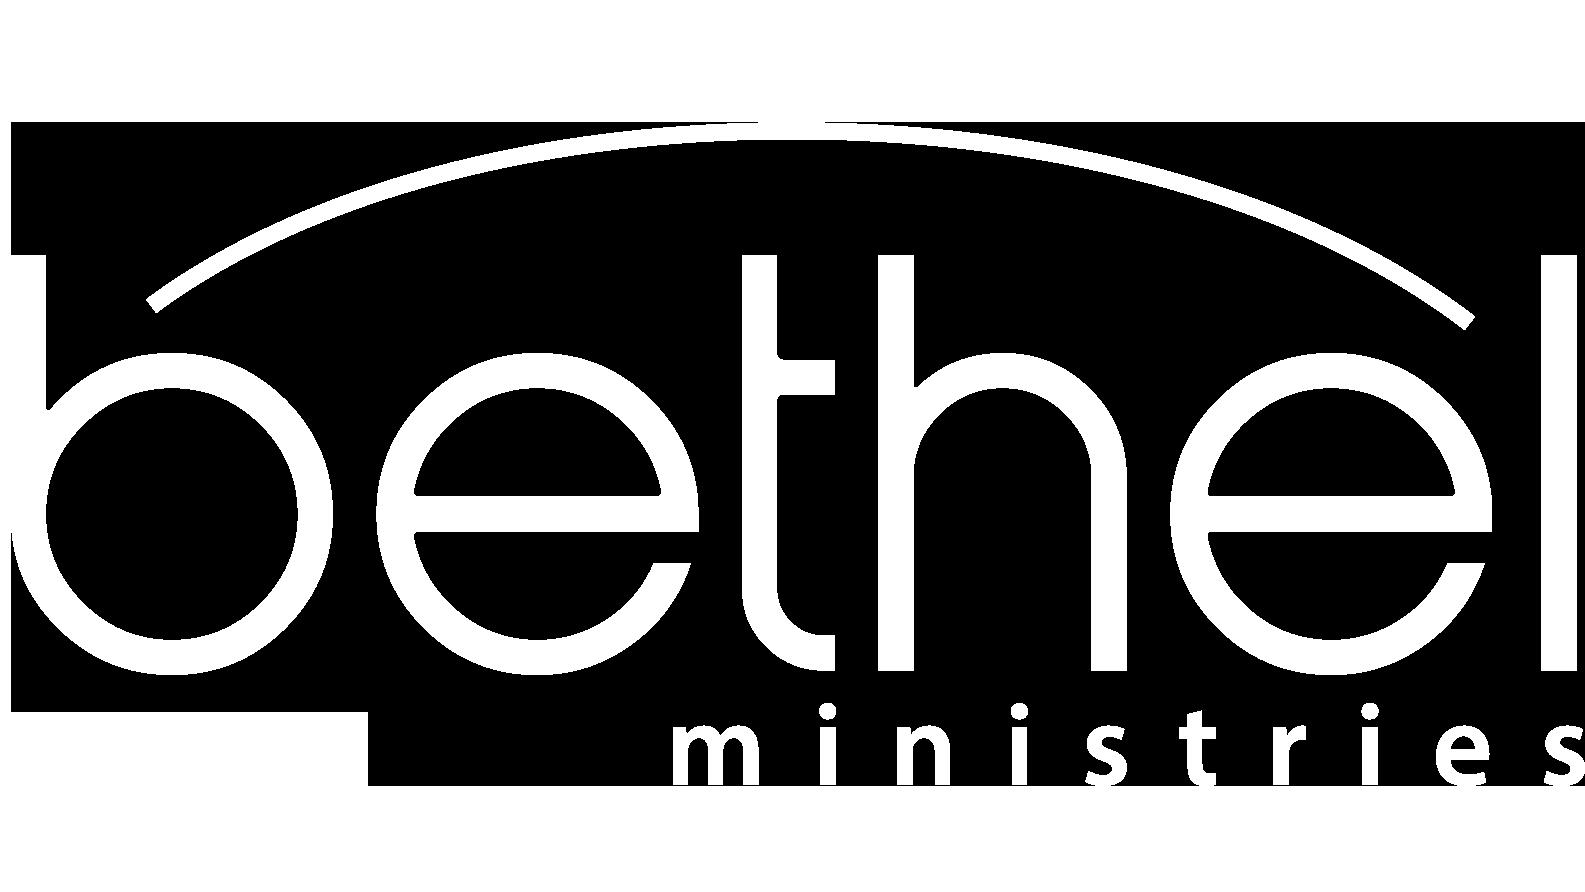 homeatbethel.info